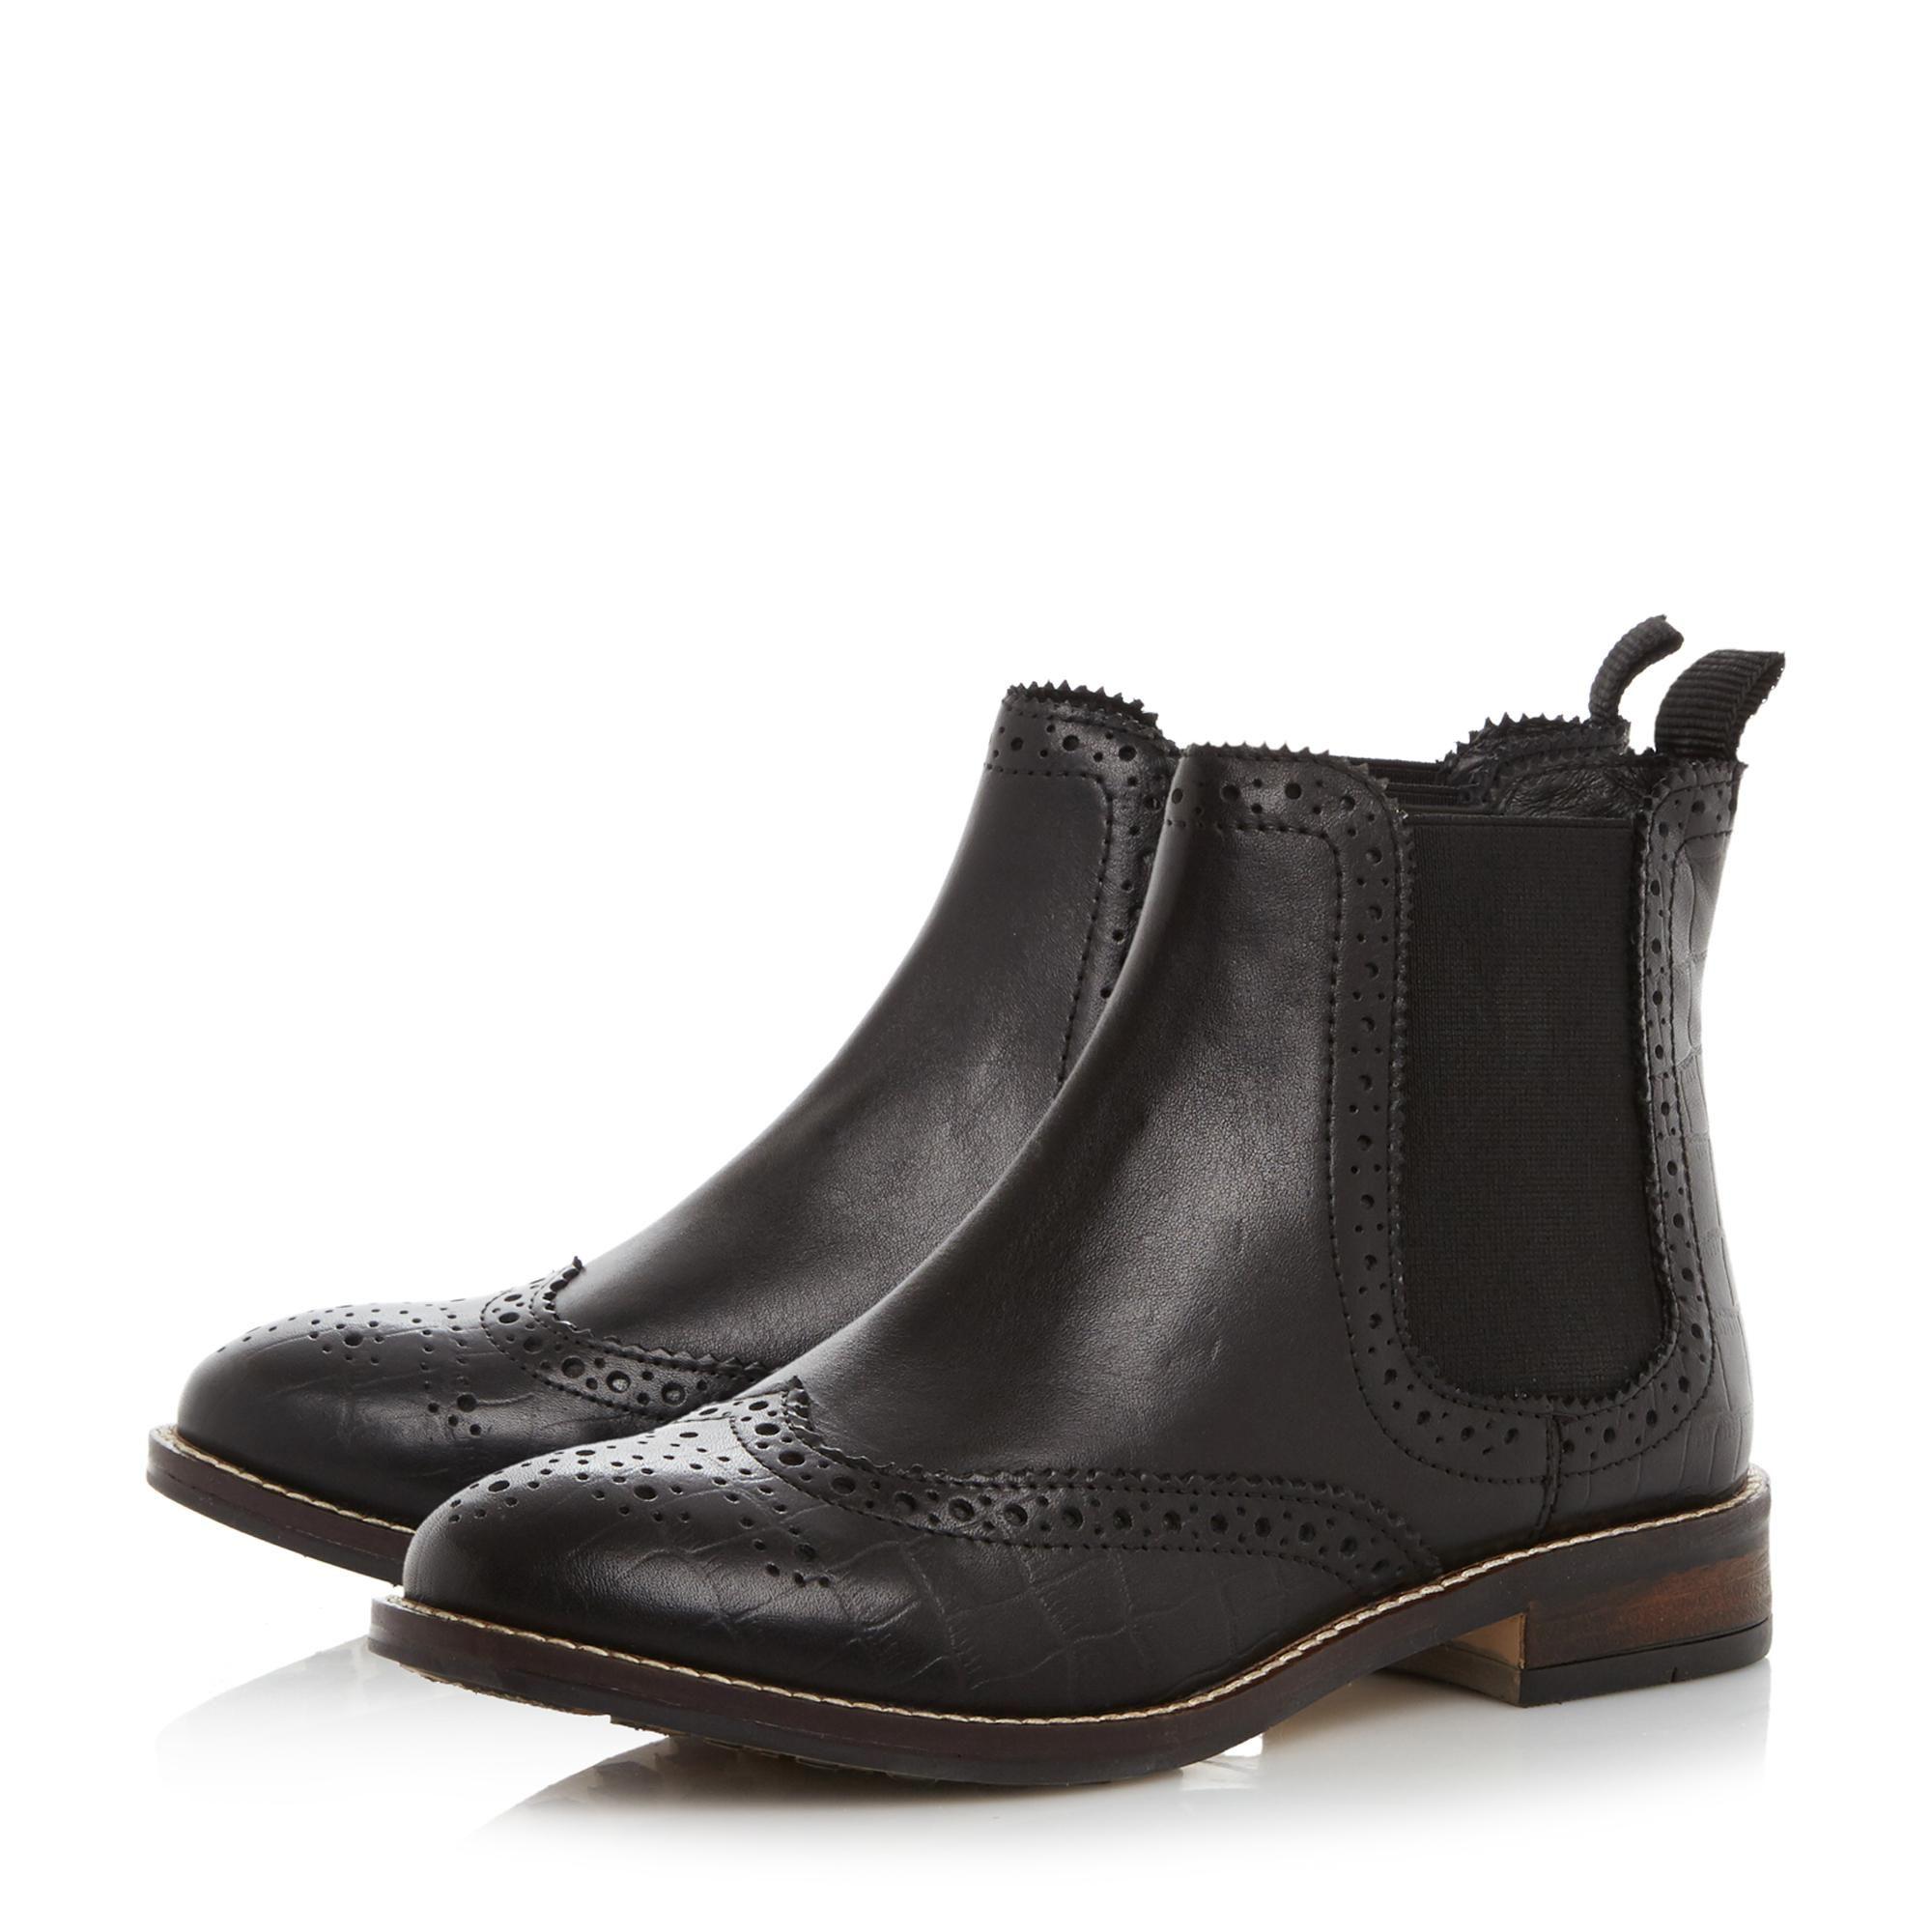 Dune Ladies QUENTONS Brogue Detail Chelsea Boots